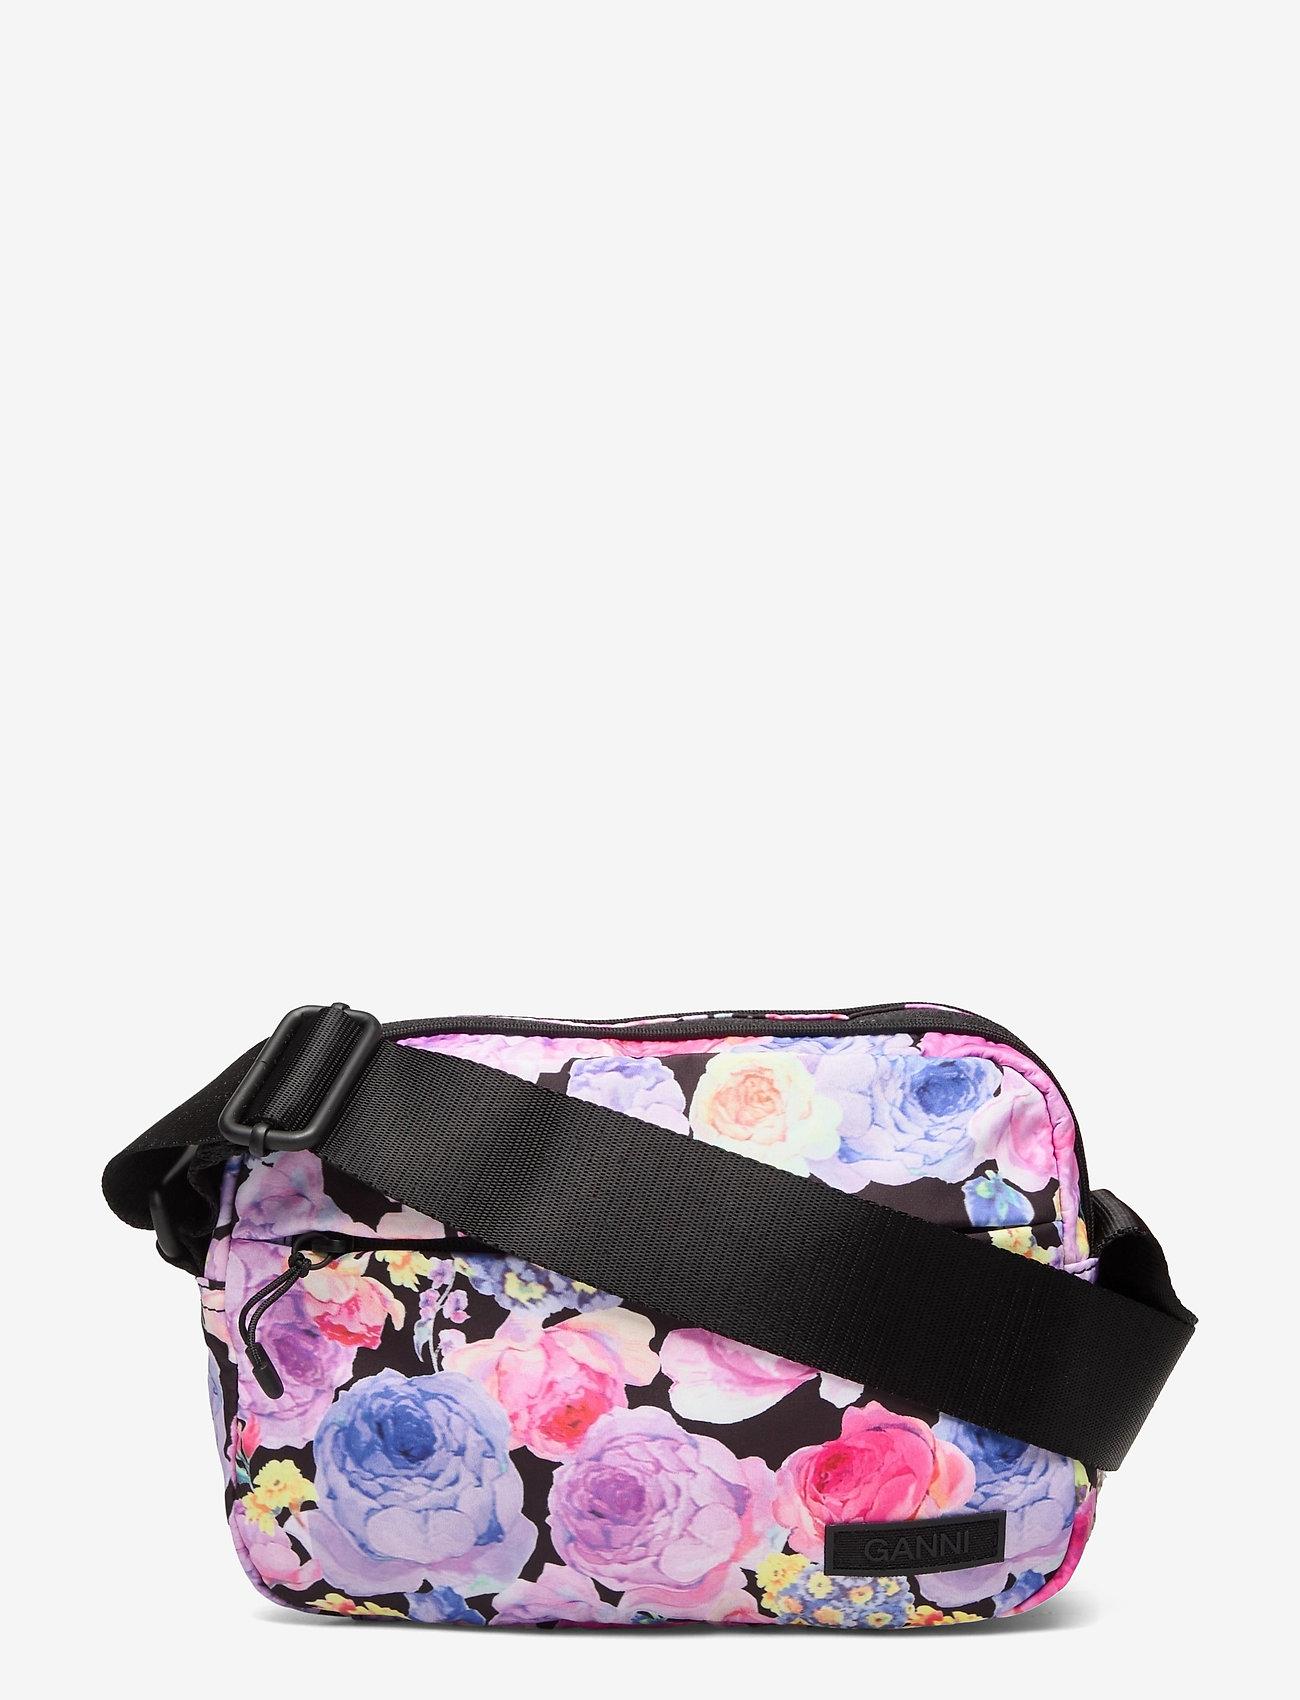 Ganni - Seasonal Recycled Tech Fabric - crossbody bags - multicolour - 0